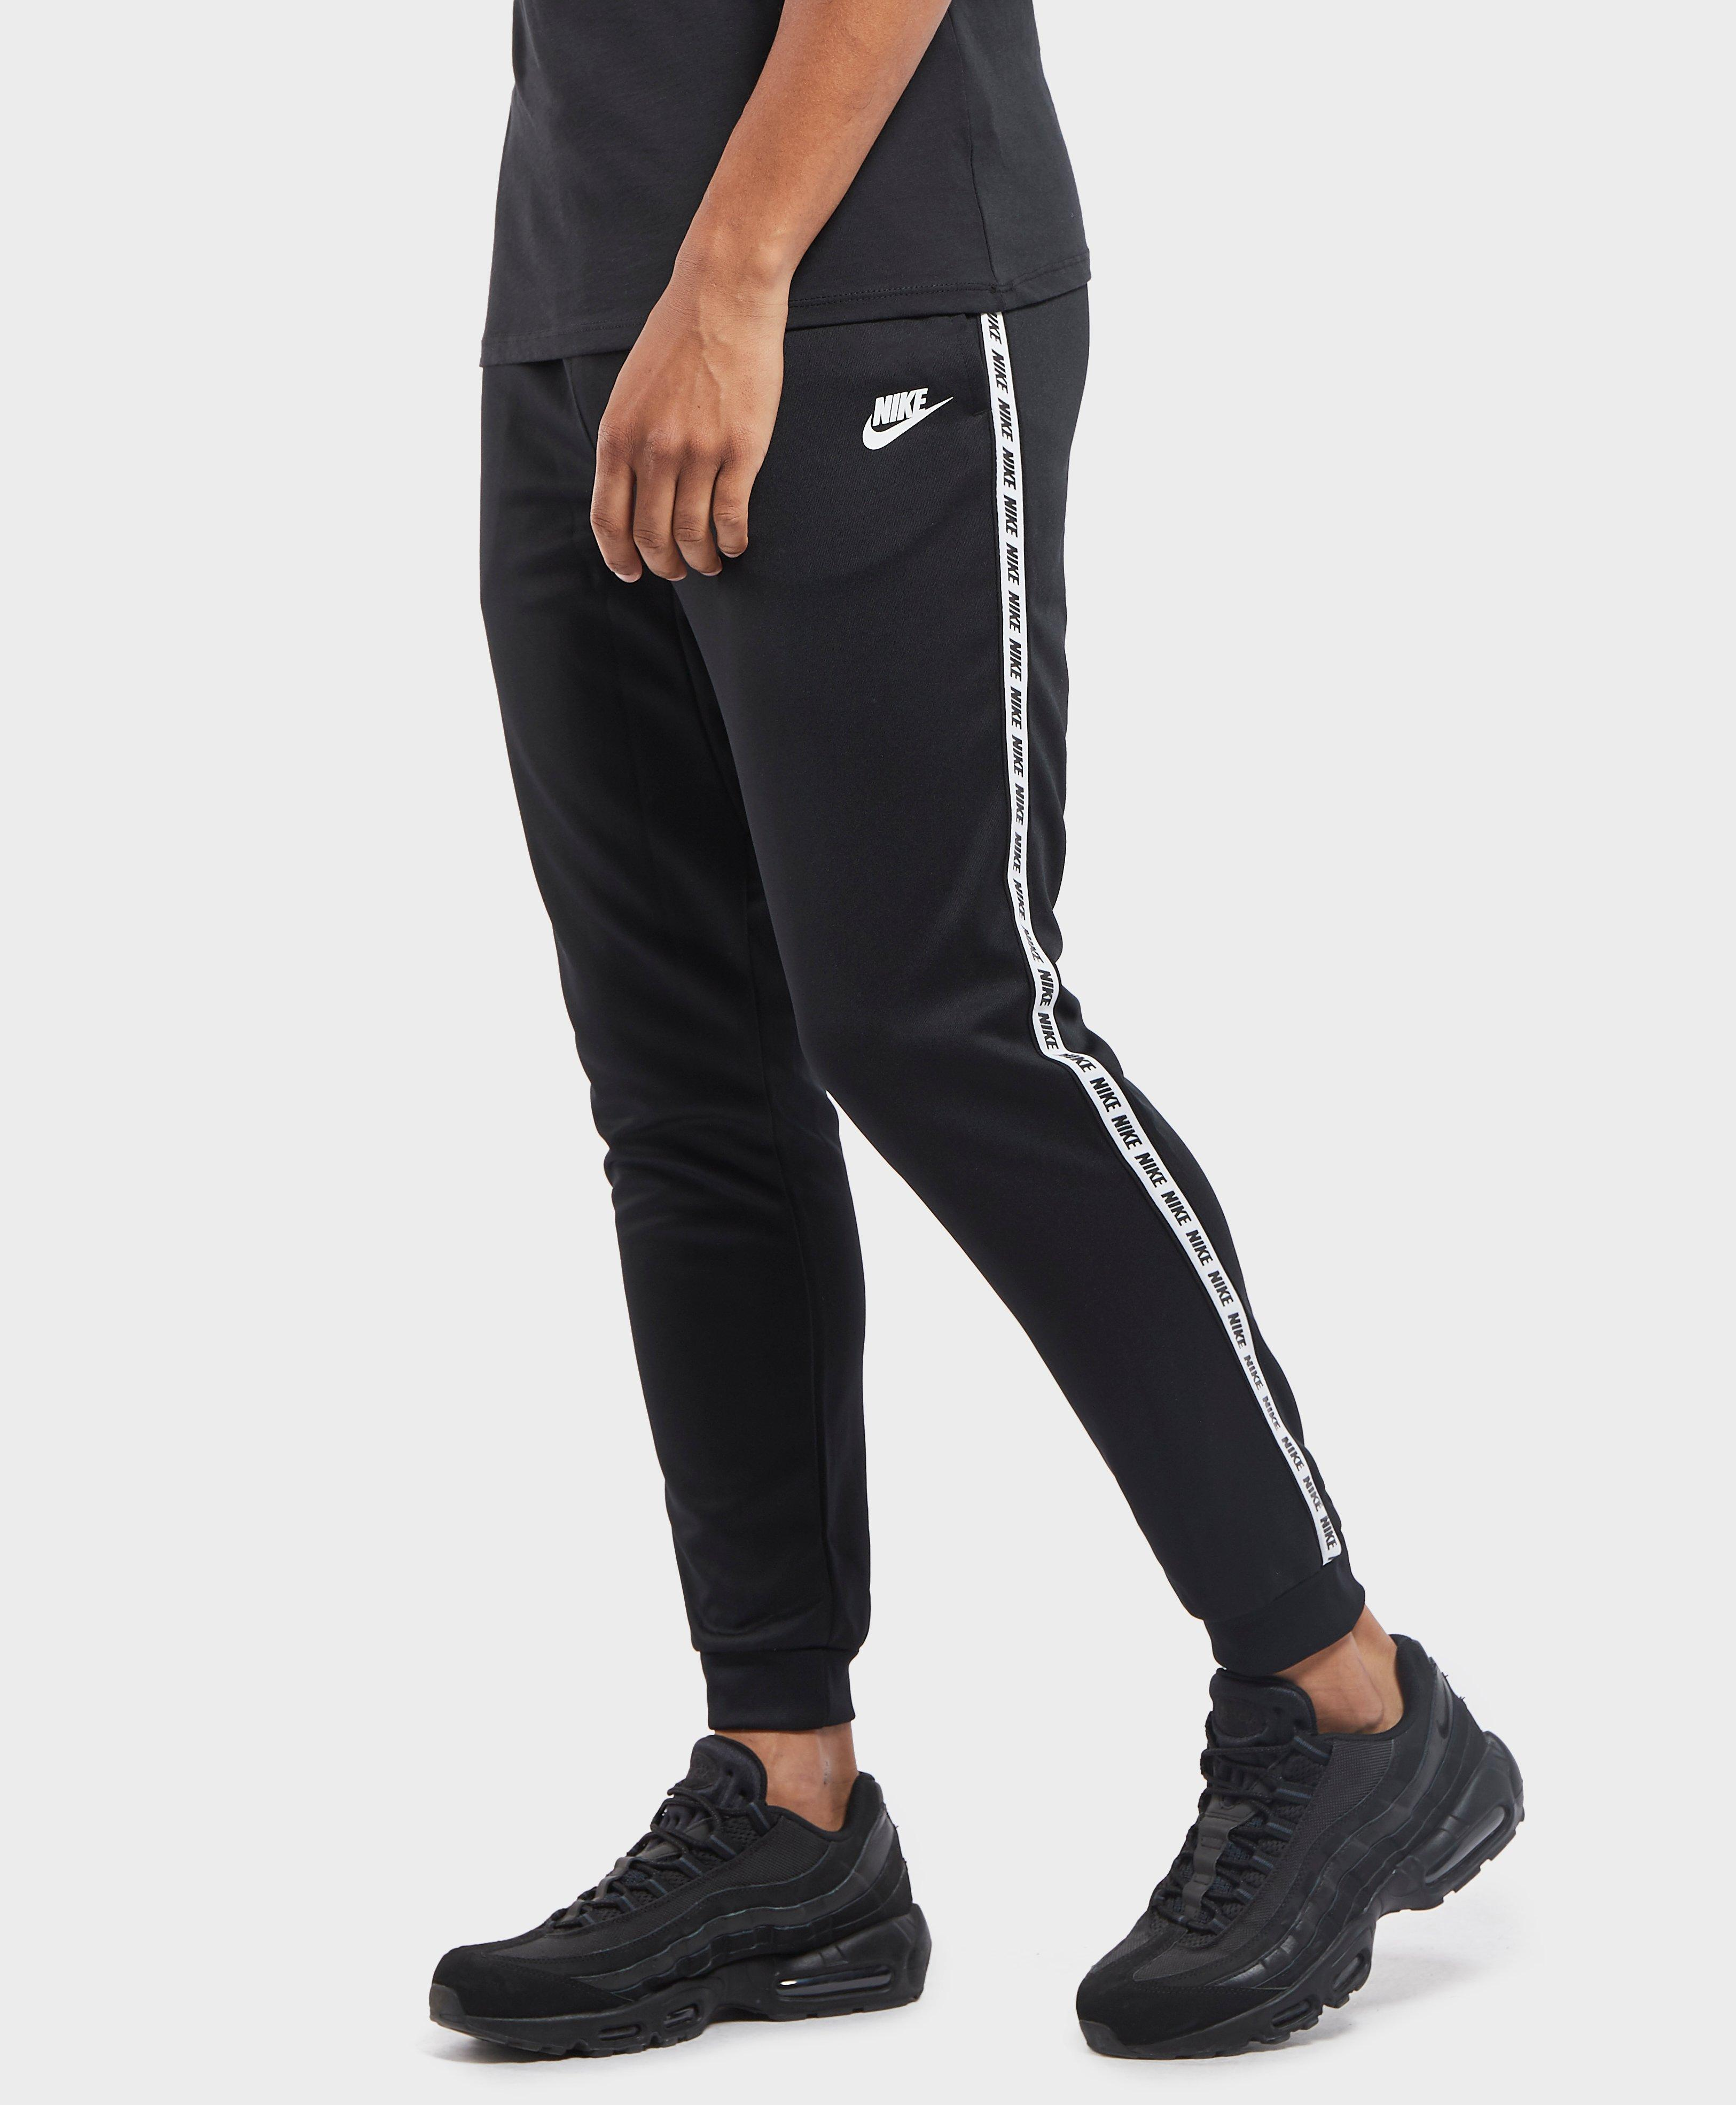 64aa94e252a Nike Gel Tape Cuffed Track Pants in Black for Men - Lyst